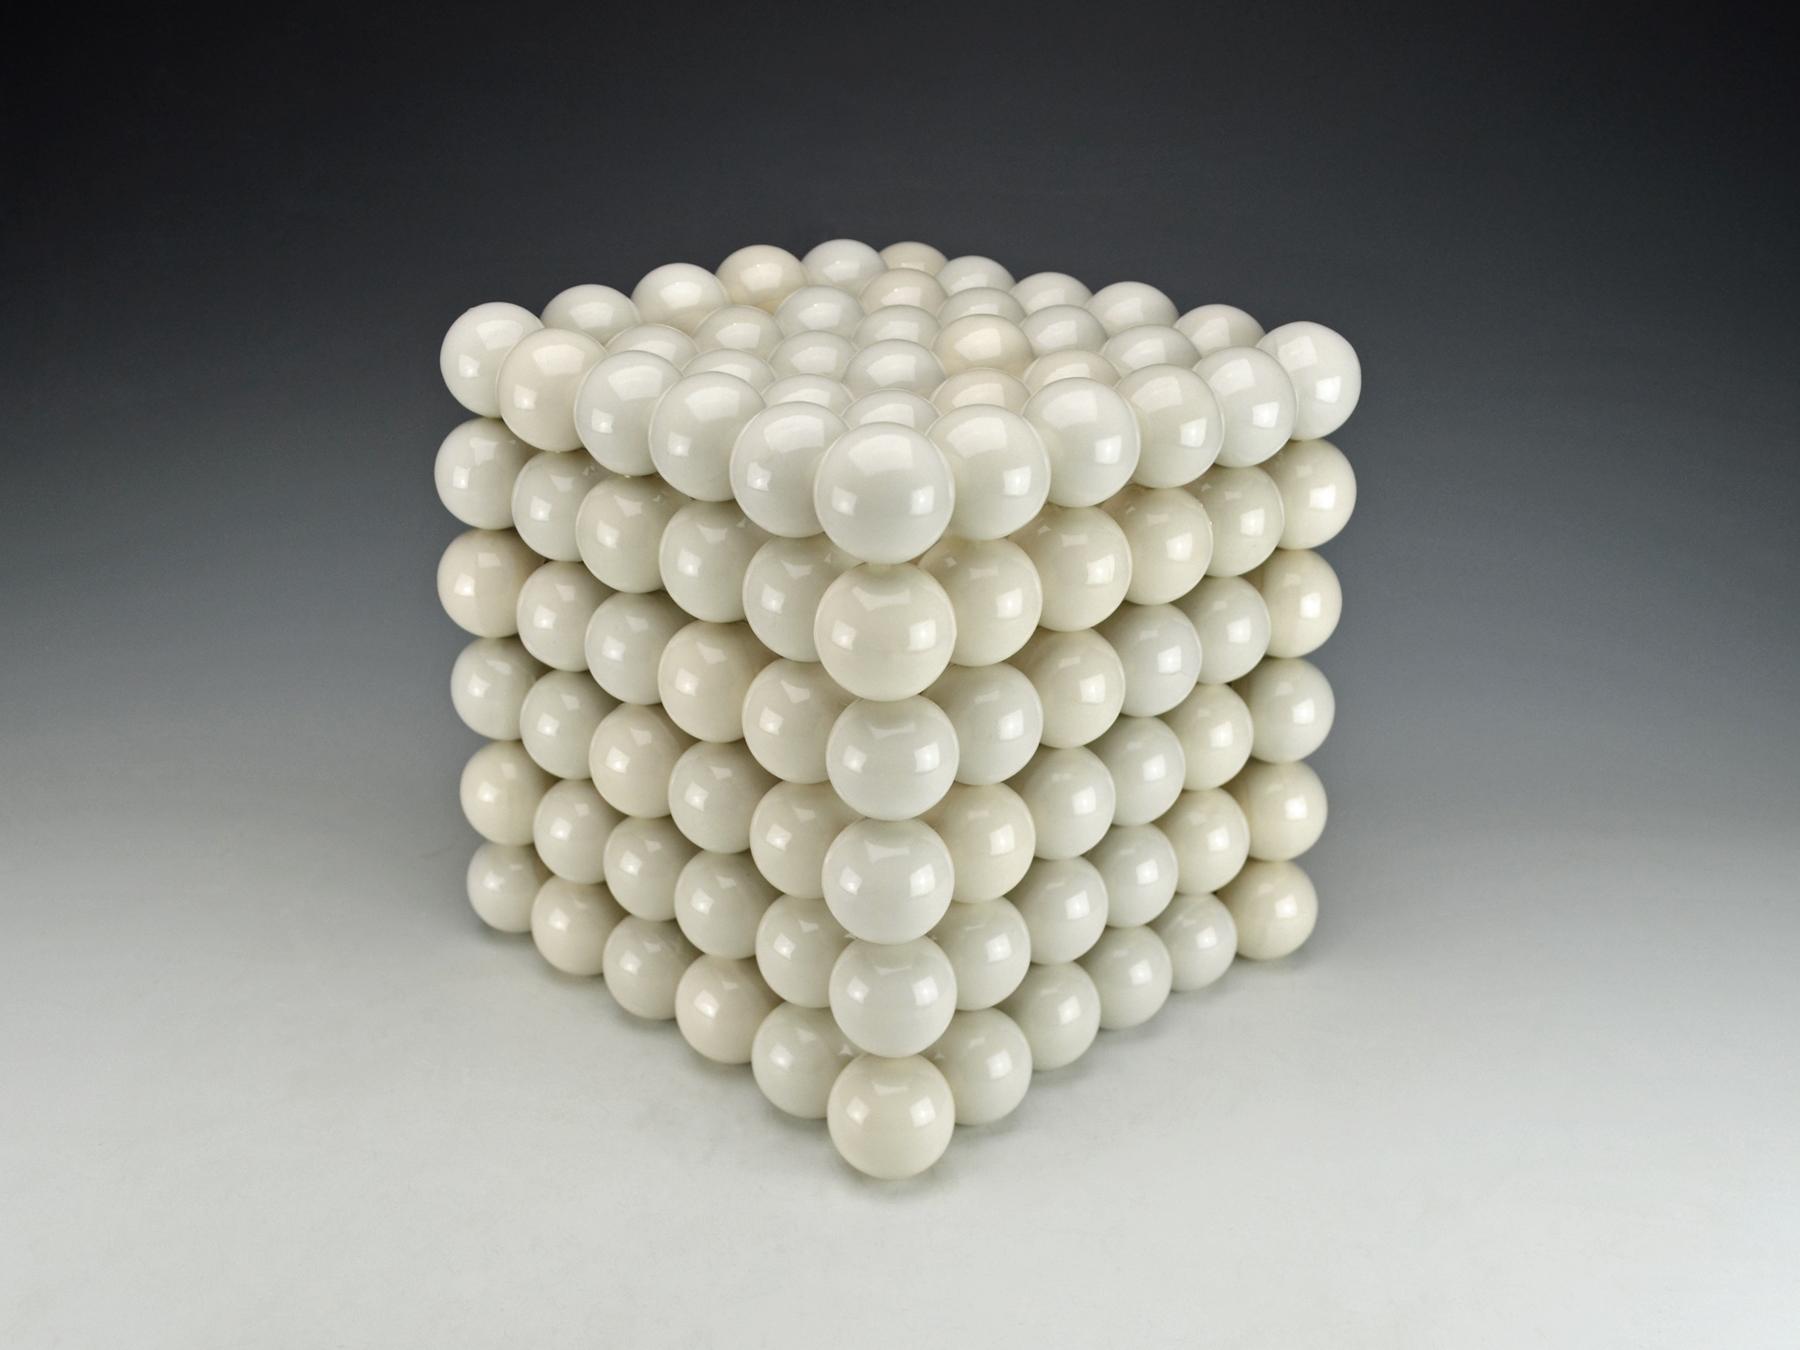 Ionic Series: Cubic Construction  |  13 x 13 x 13 inches  |  Porcelain, Glaze  |  2017